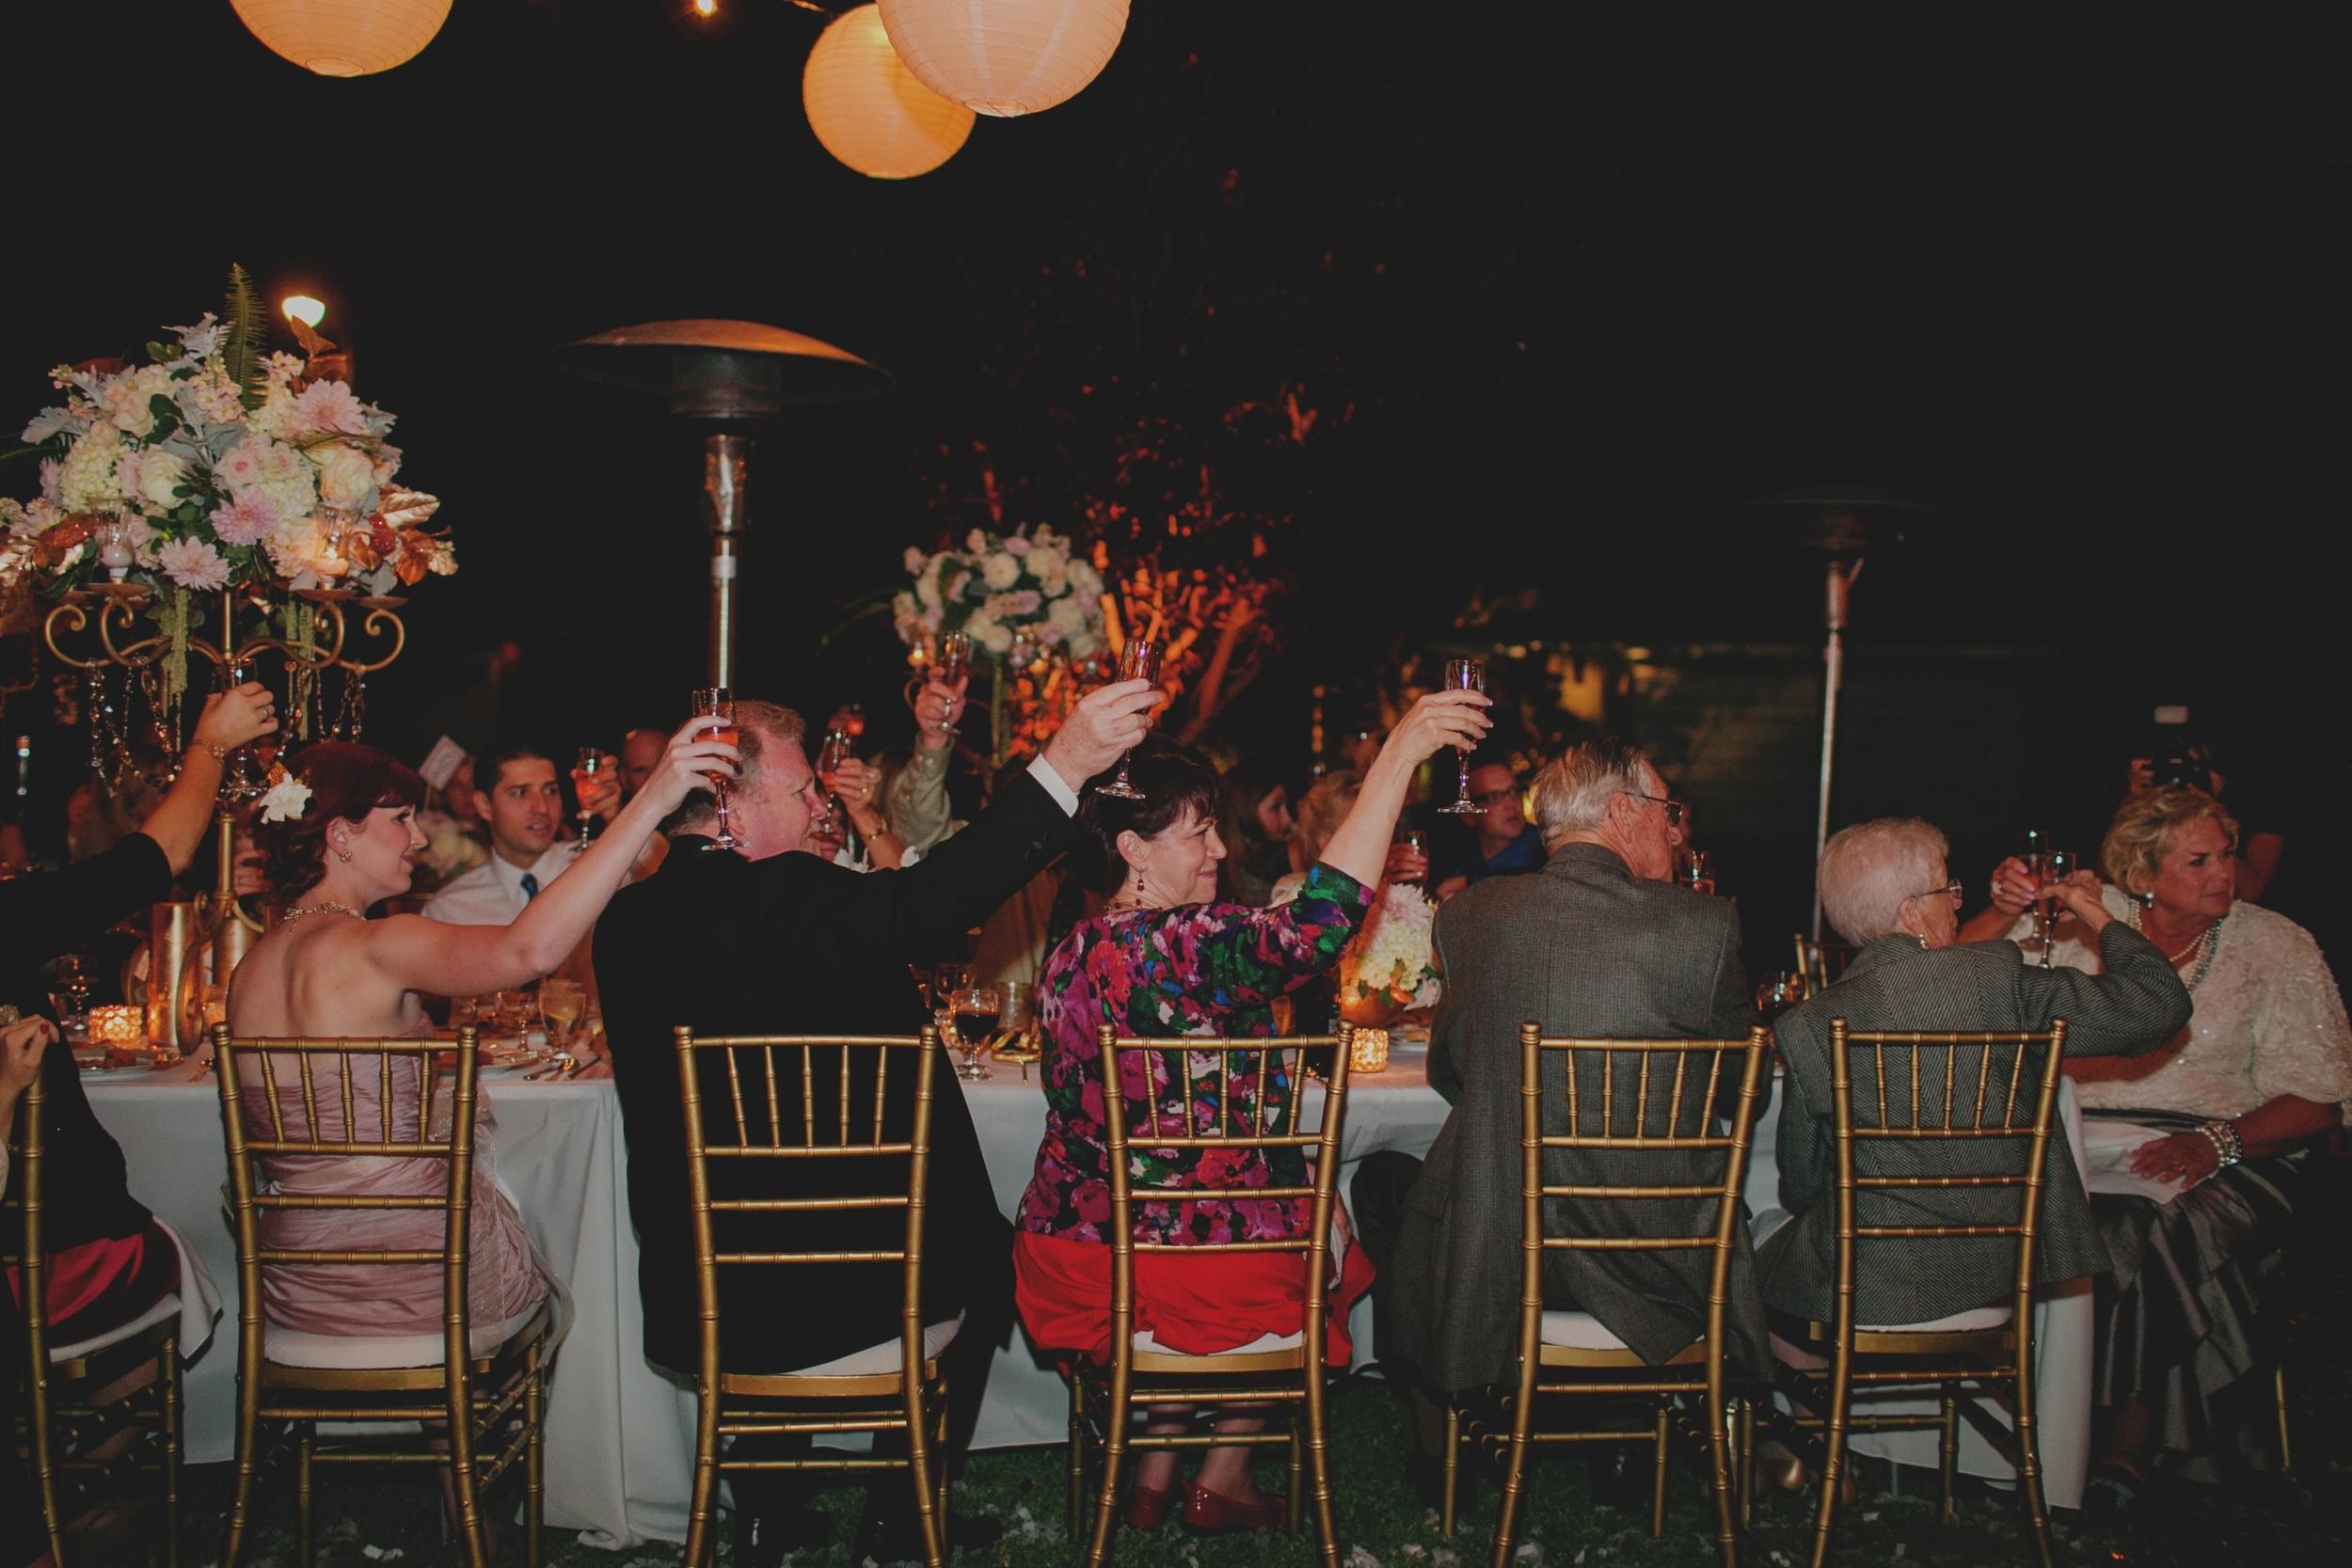 The-Suitcase-Studio-Timree-Matt-Lifestyle-Wedding-Photographer-098.jpg